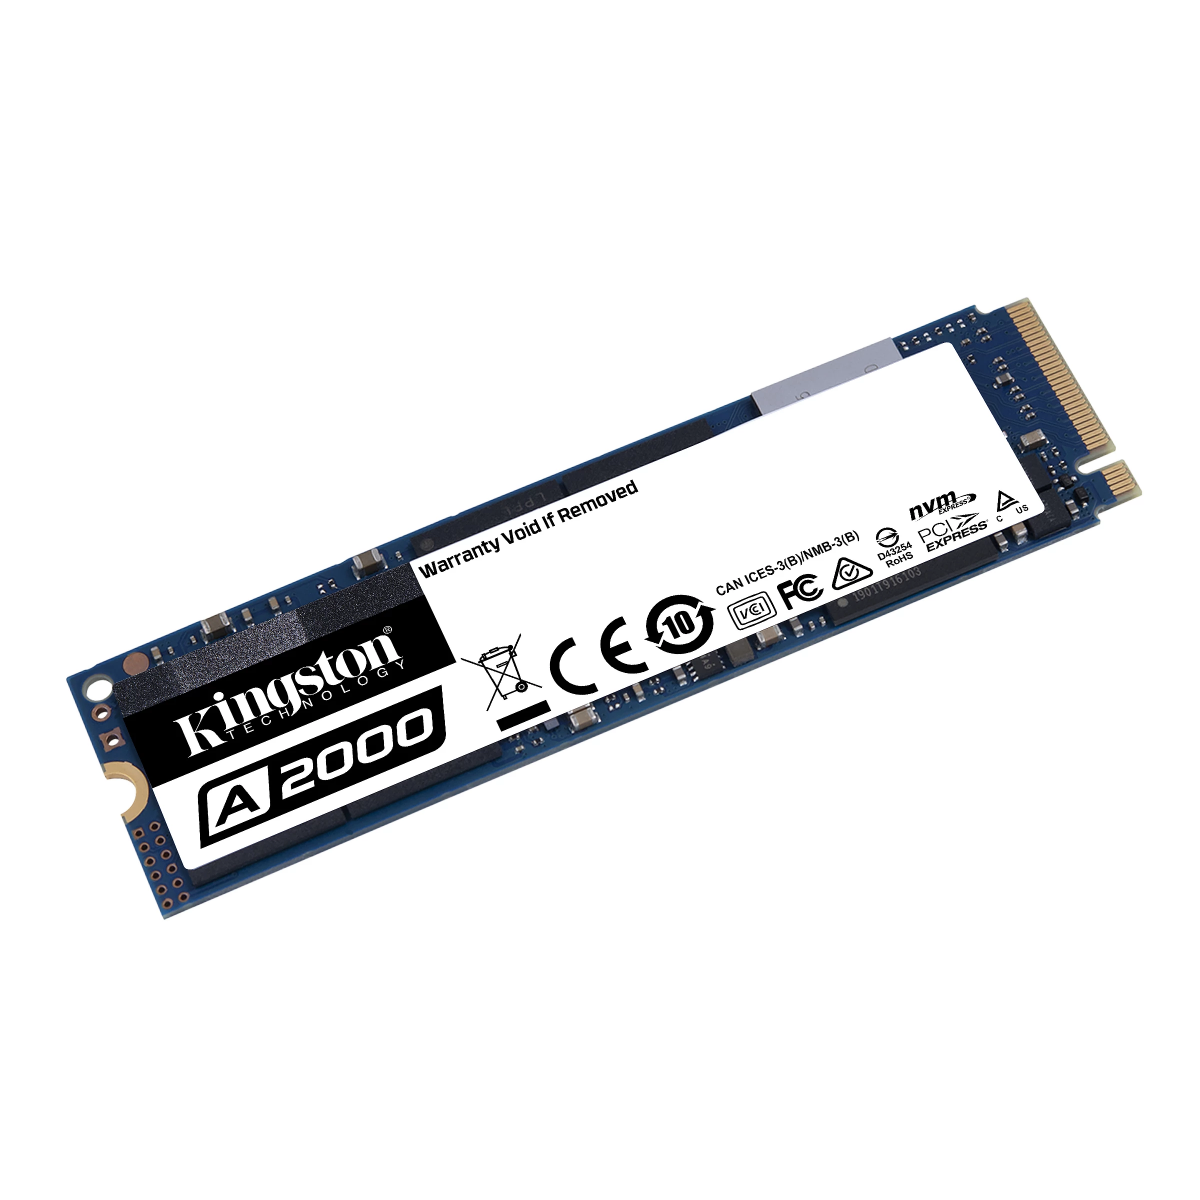 SSD Kingston A2000, 500GB, M.2 NVMe, Leitura 2200MBs e Gravação 2000MBs, SA2000M8/500G